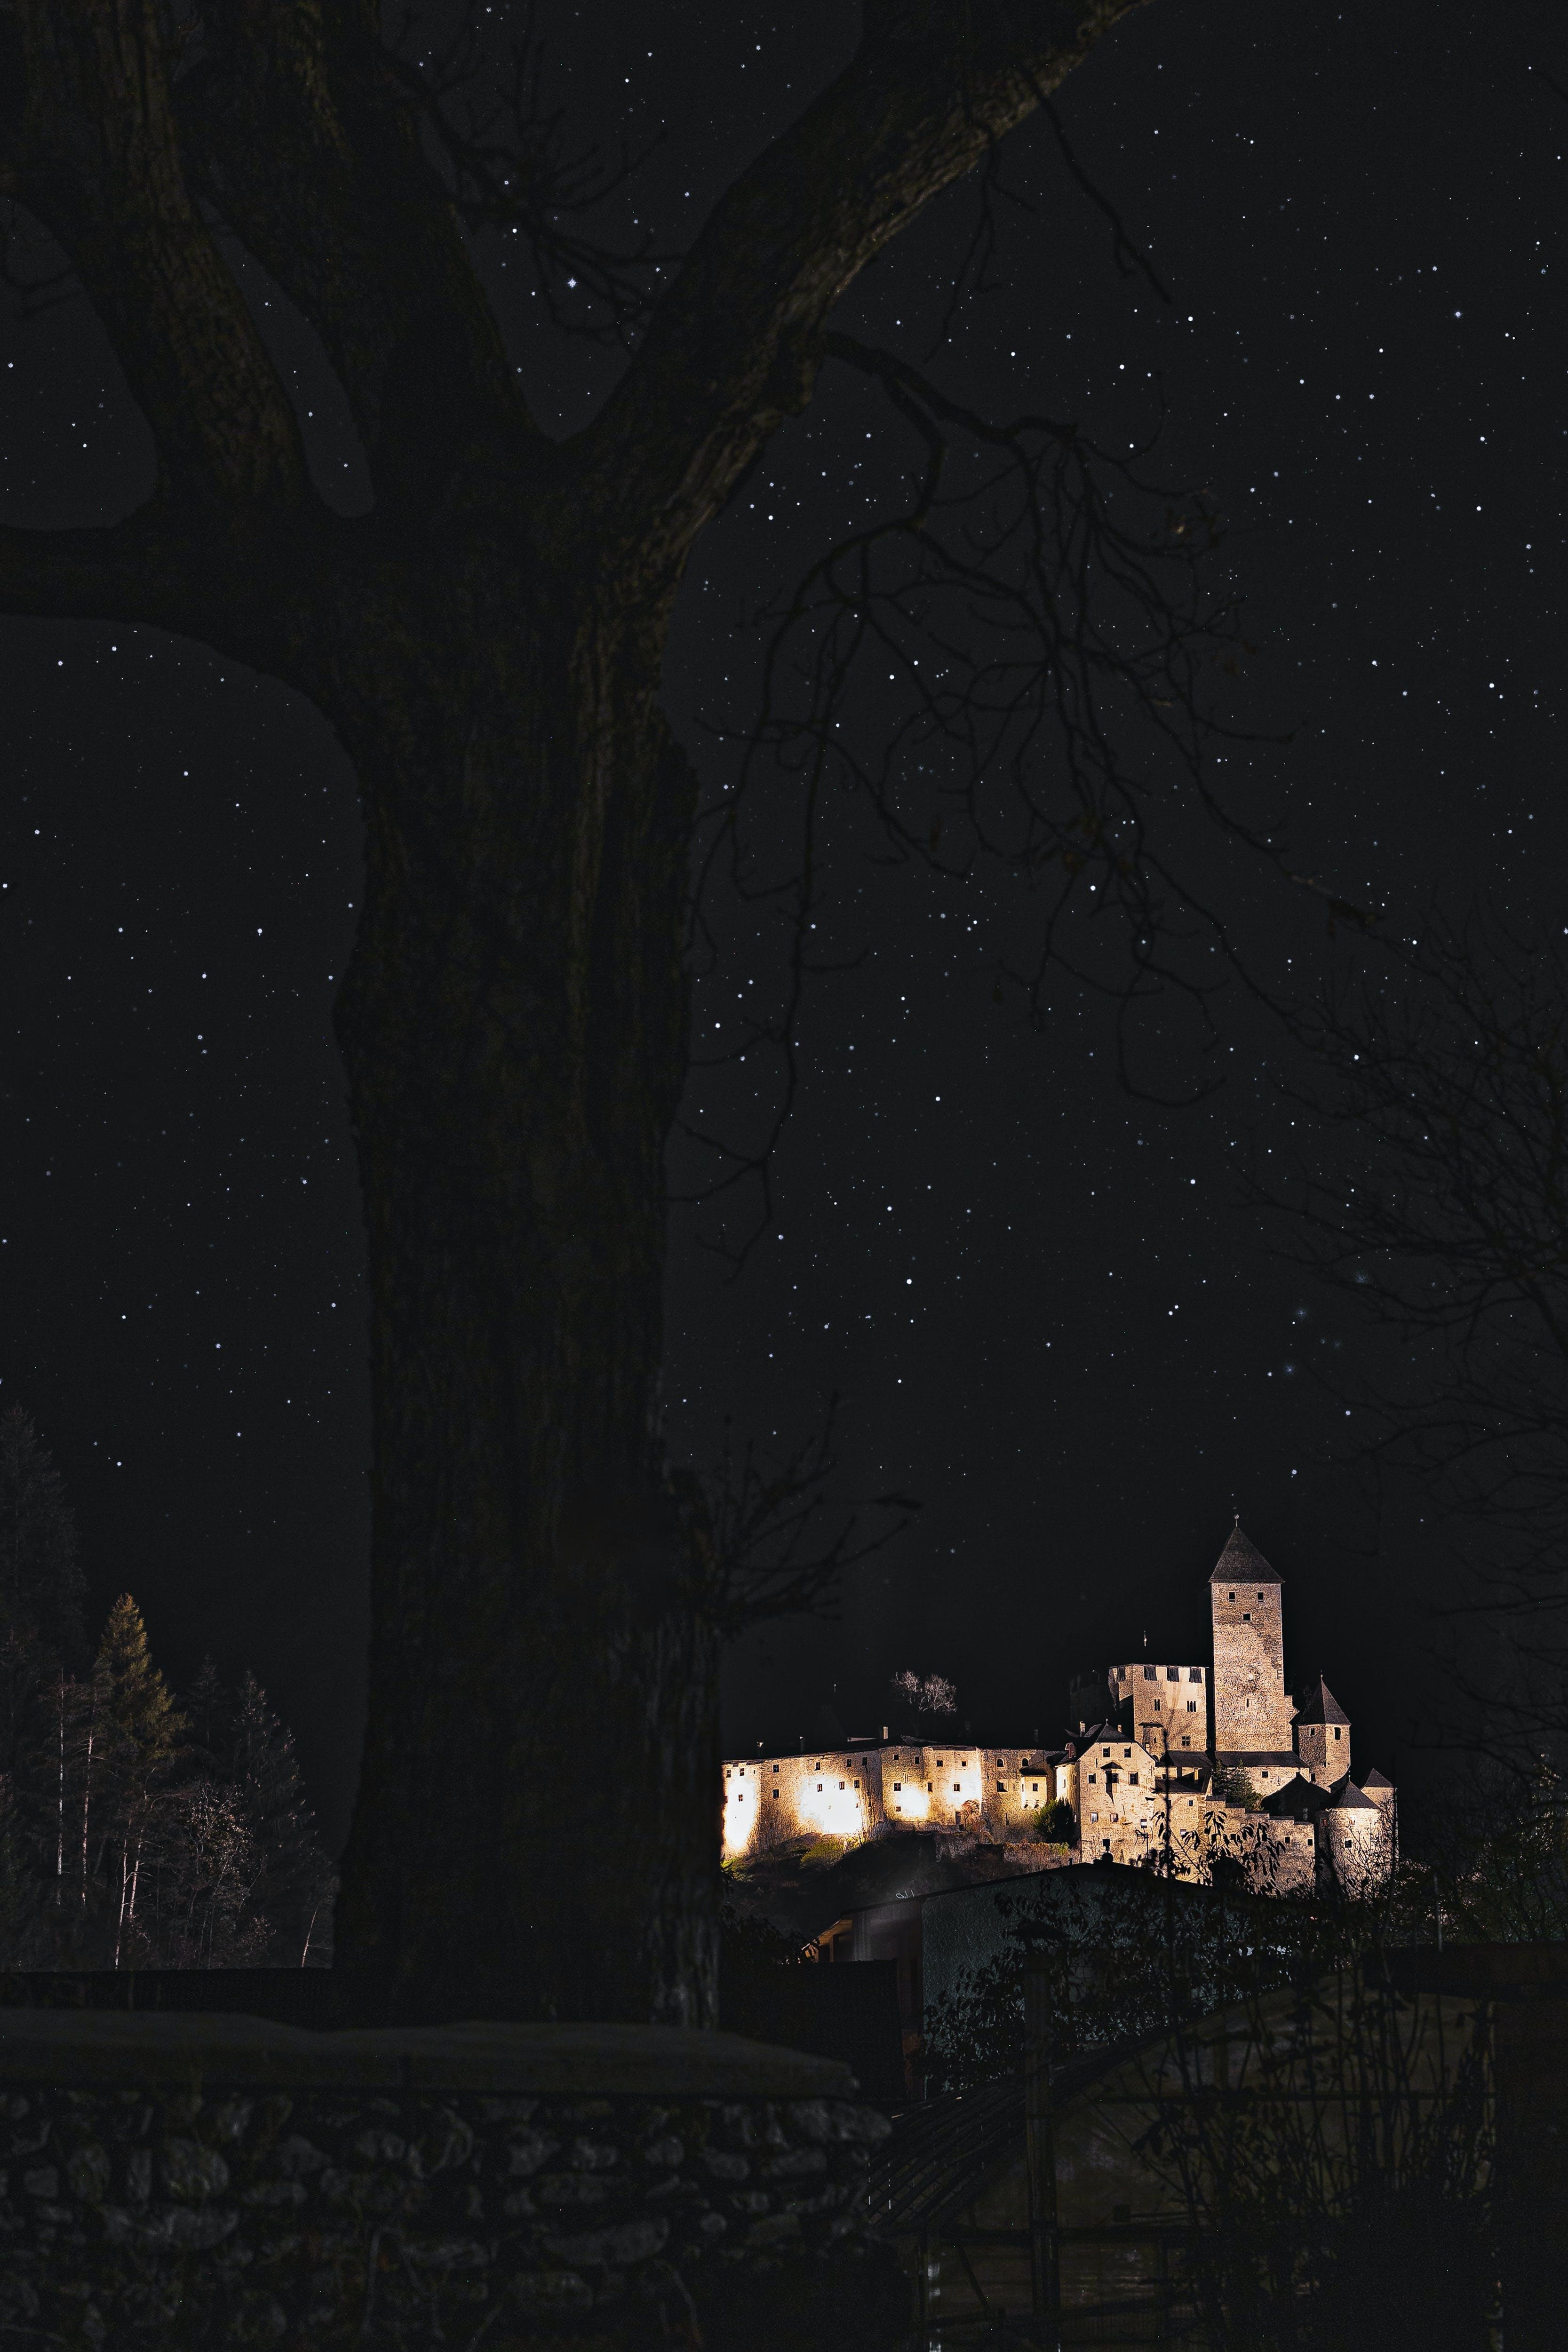 Brown Castle Under a Starry Sky